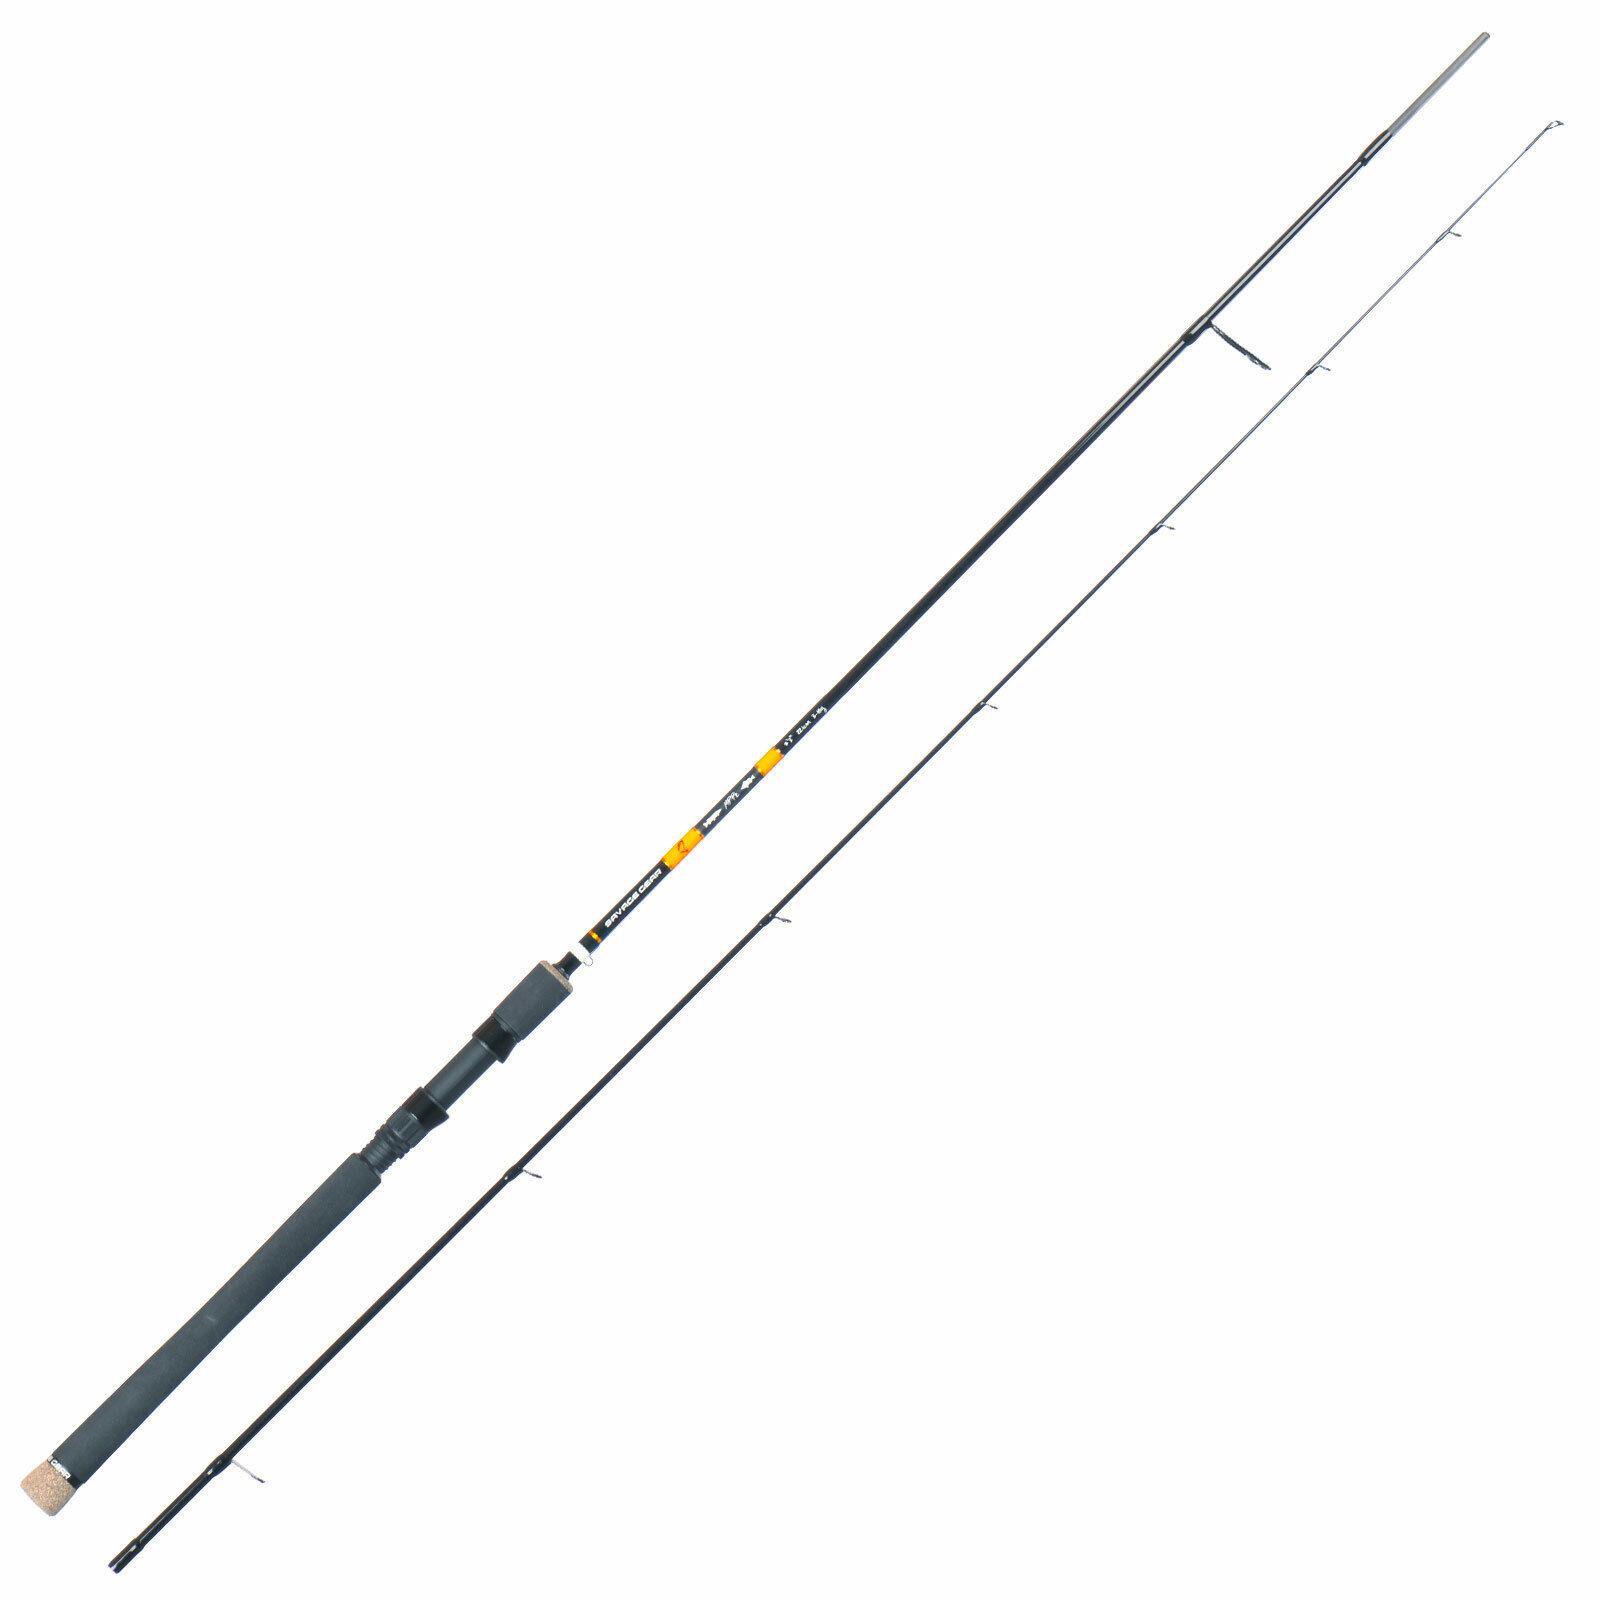 Savage Gear spinning canna da pesca MultiPurpose Prossoator 2 mpp2 SPIN 2,74m 520g